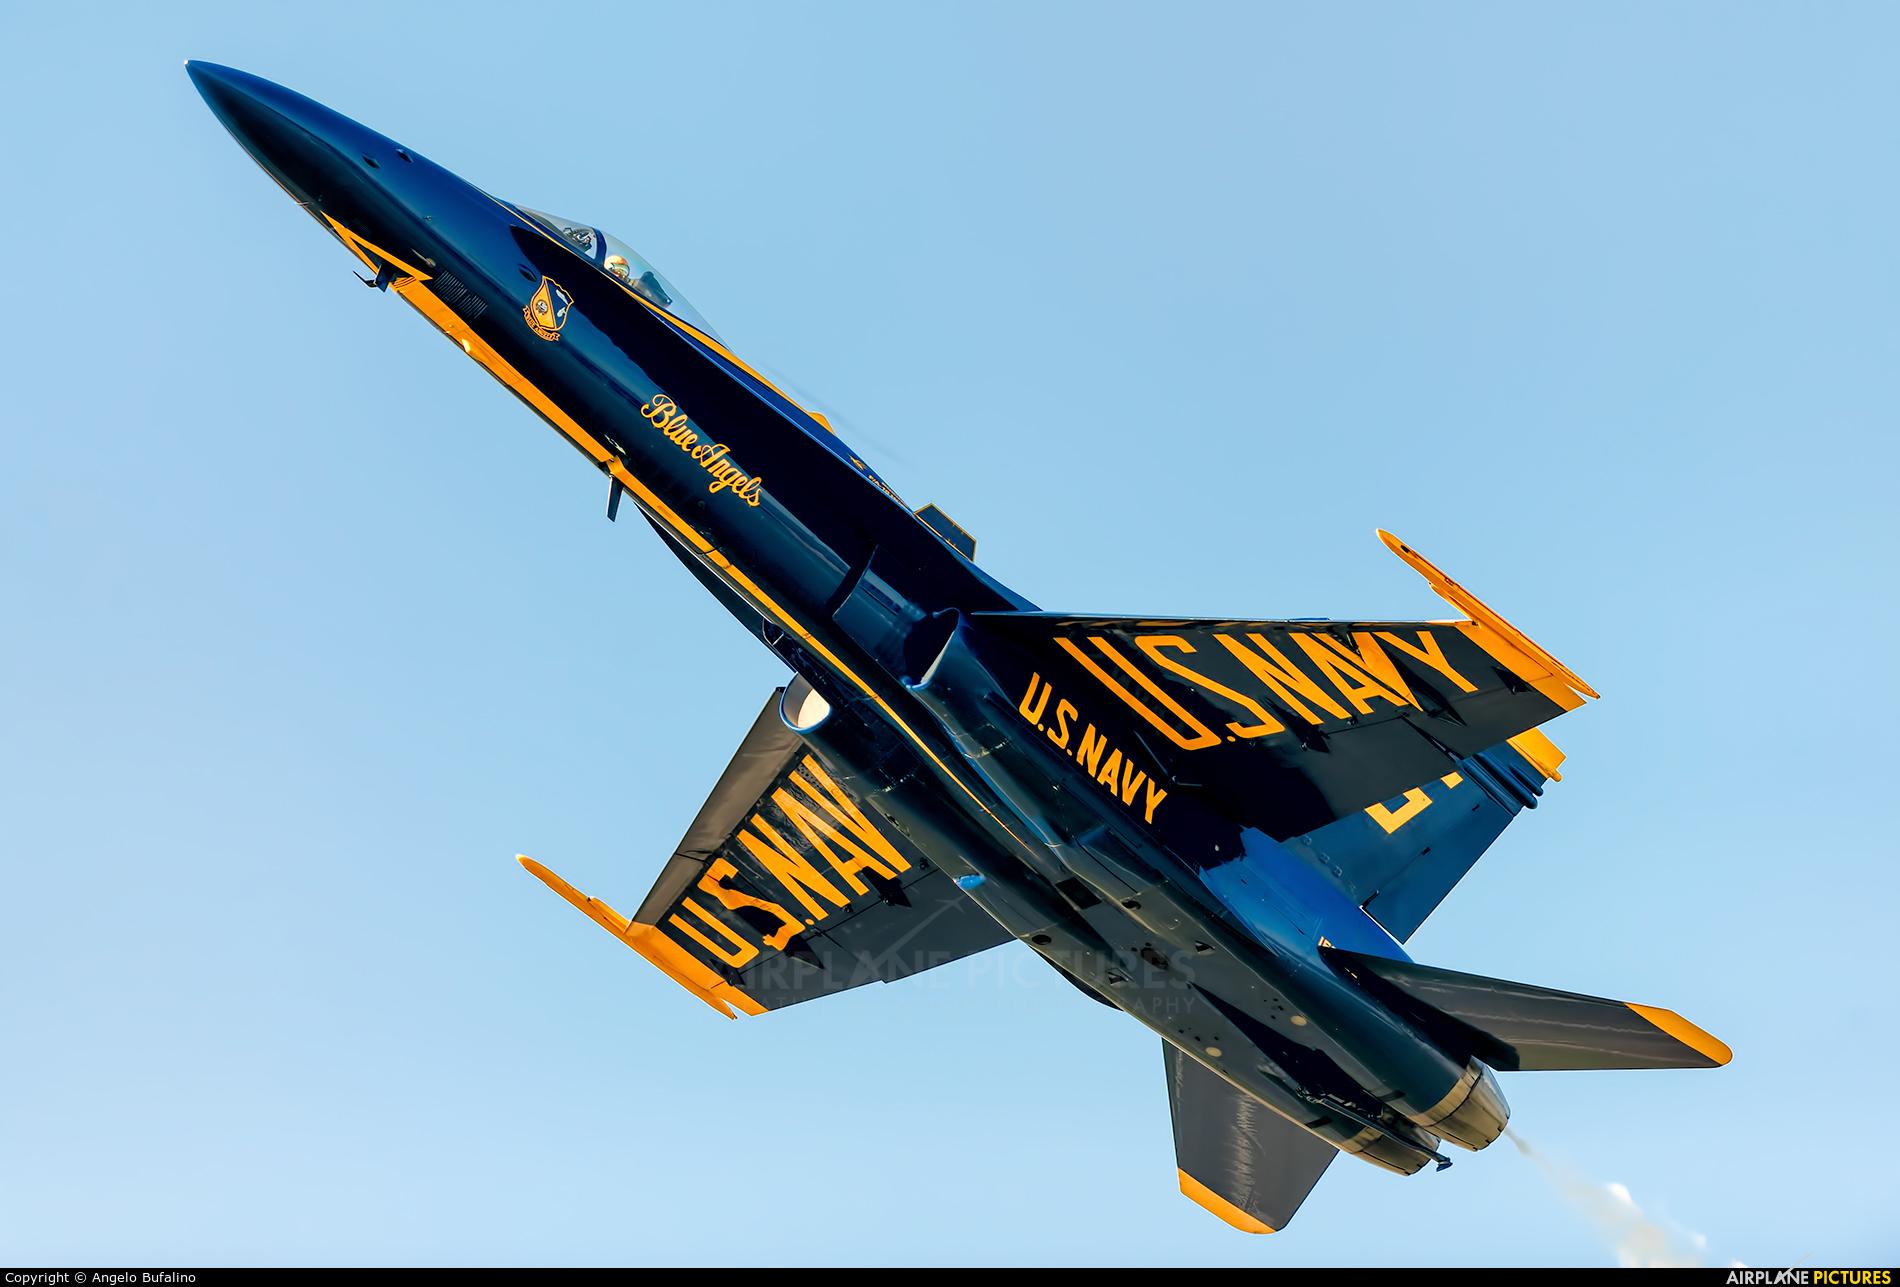 USA - Navy : Blue Angels 163484 aircraft at Millington Regional Jetport